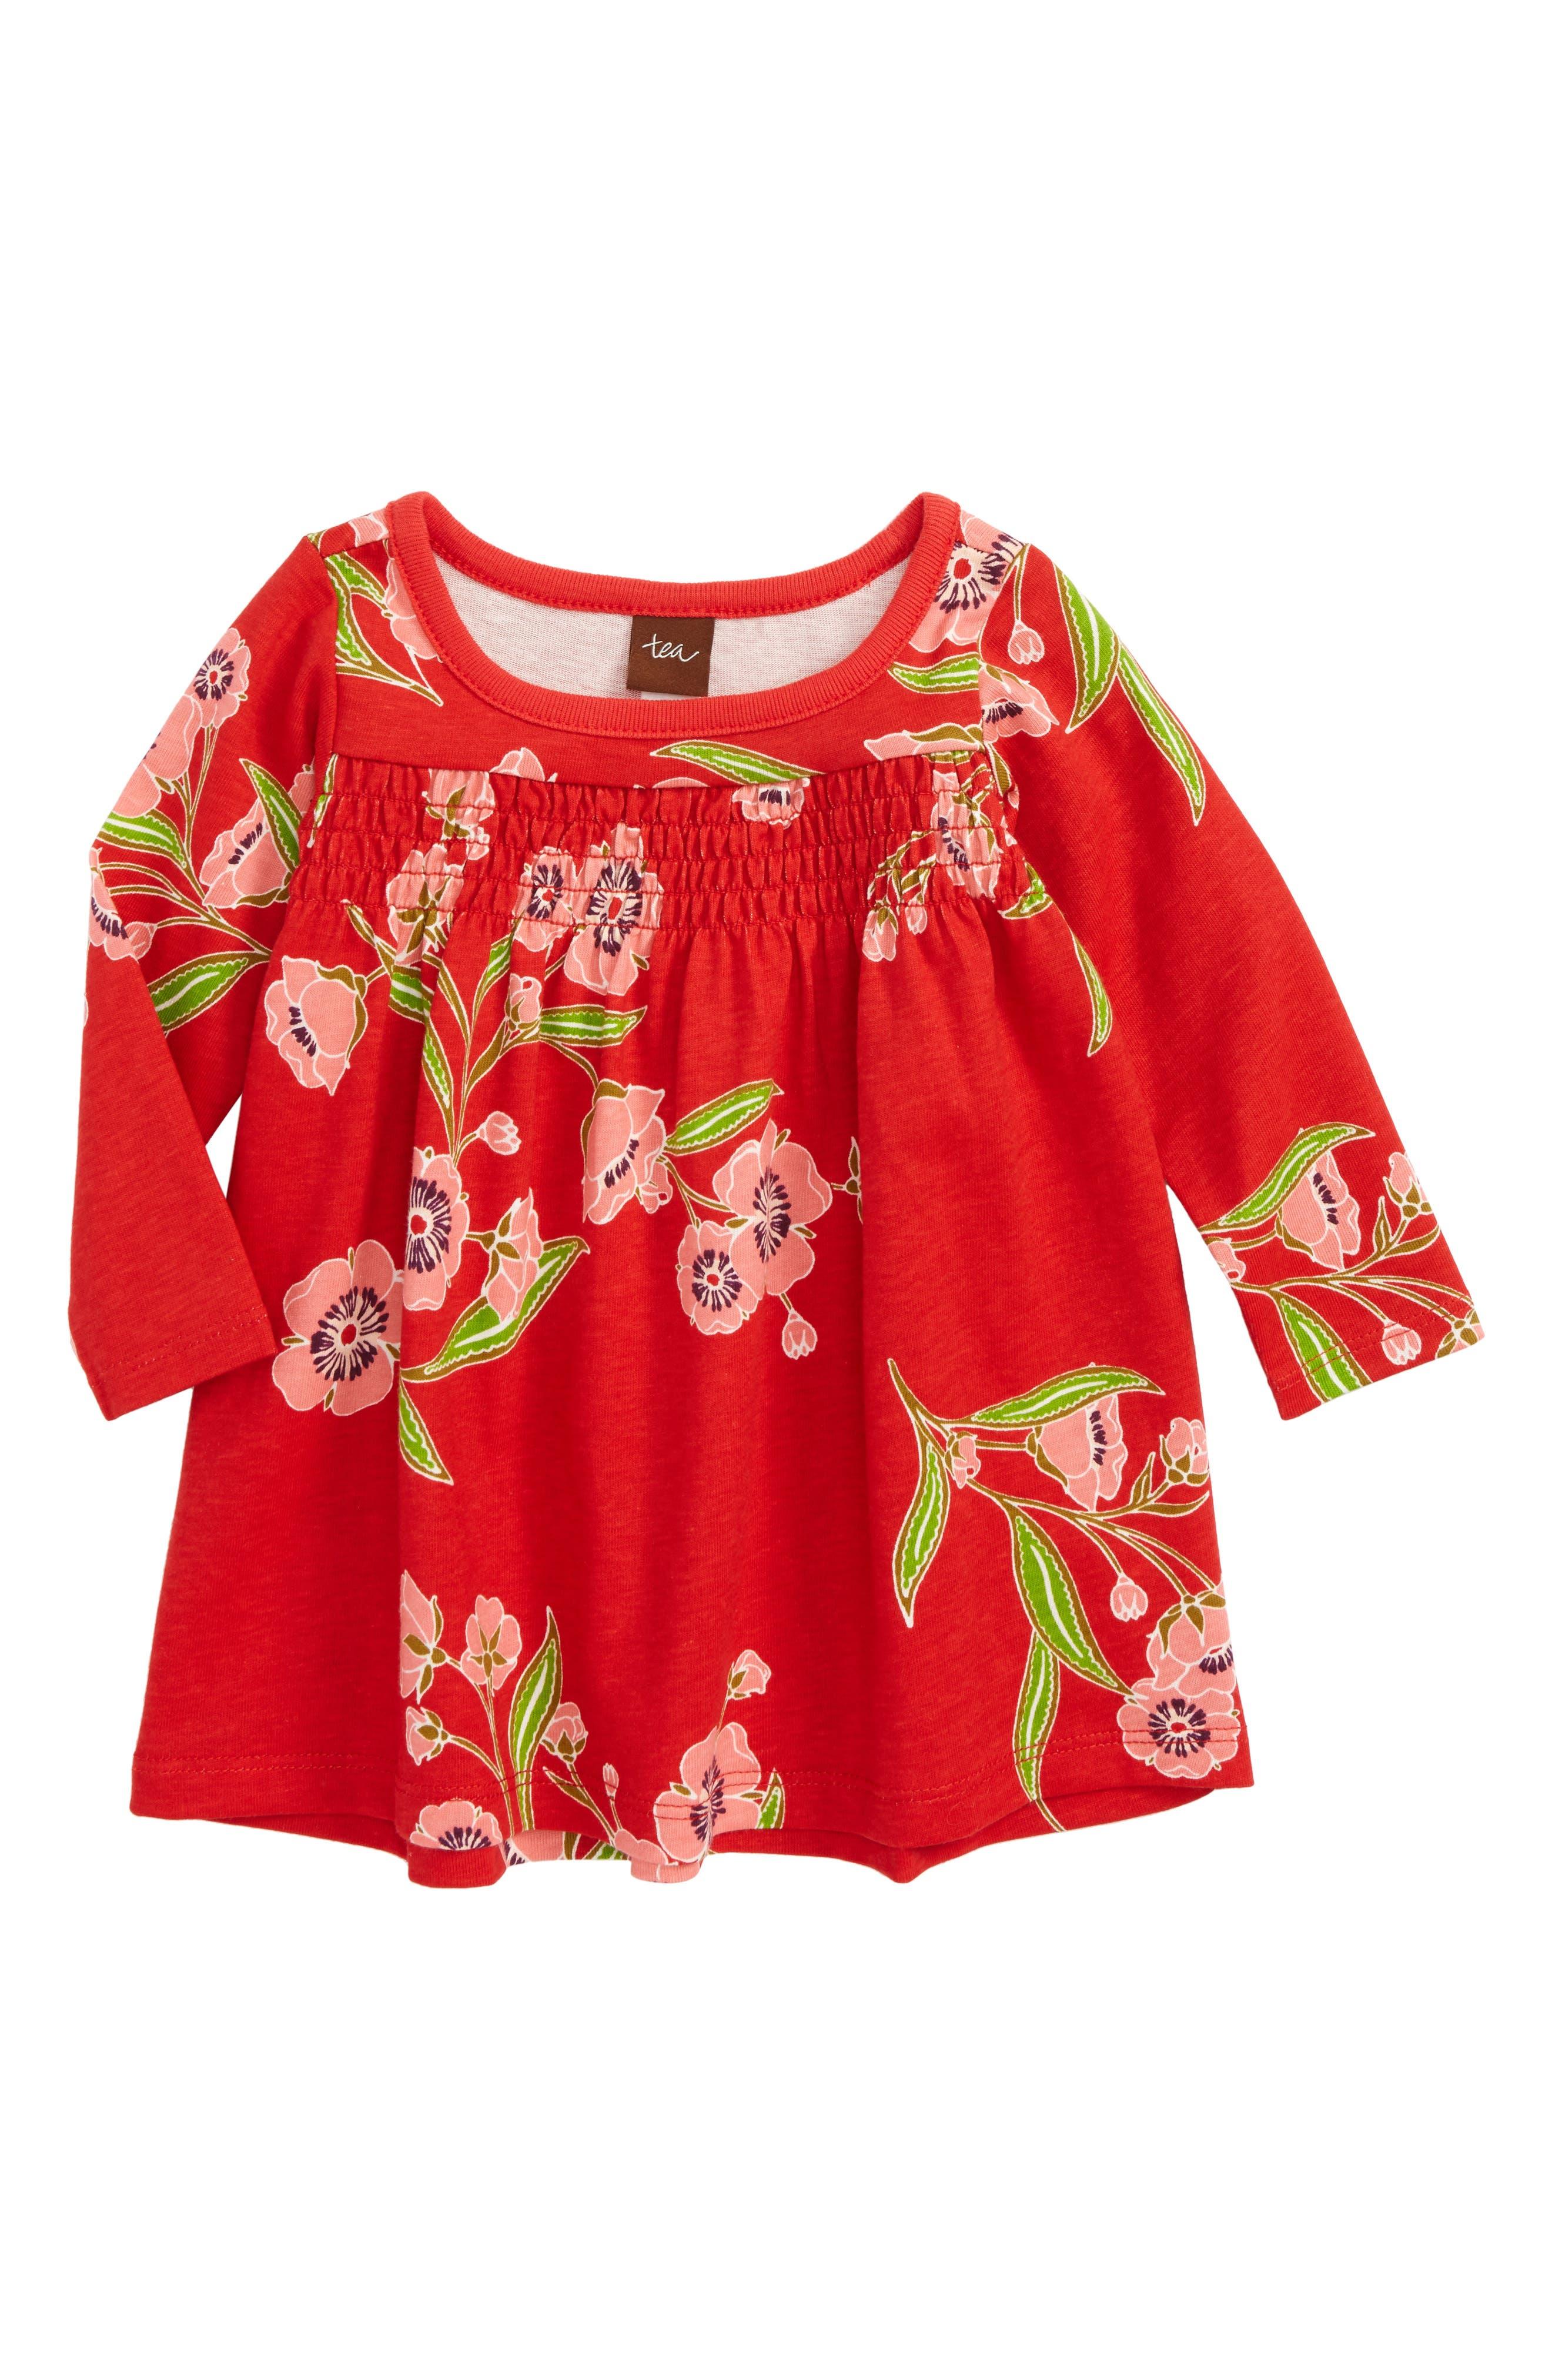 Rowan Smocked Dress,                             Main thumbnail 1, color,                             615